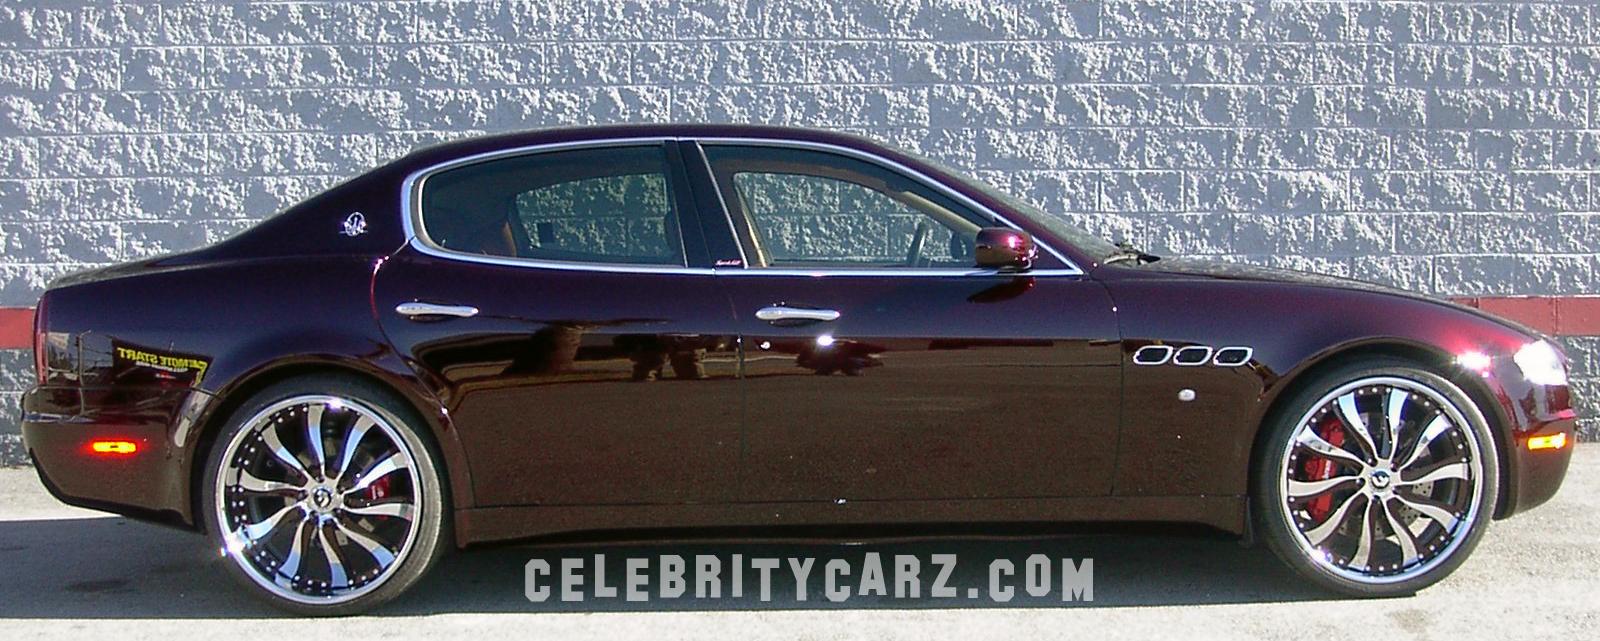 Plies | Maserati Quattroporte | Celebrity Carz